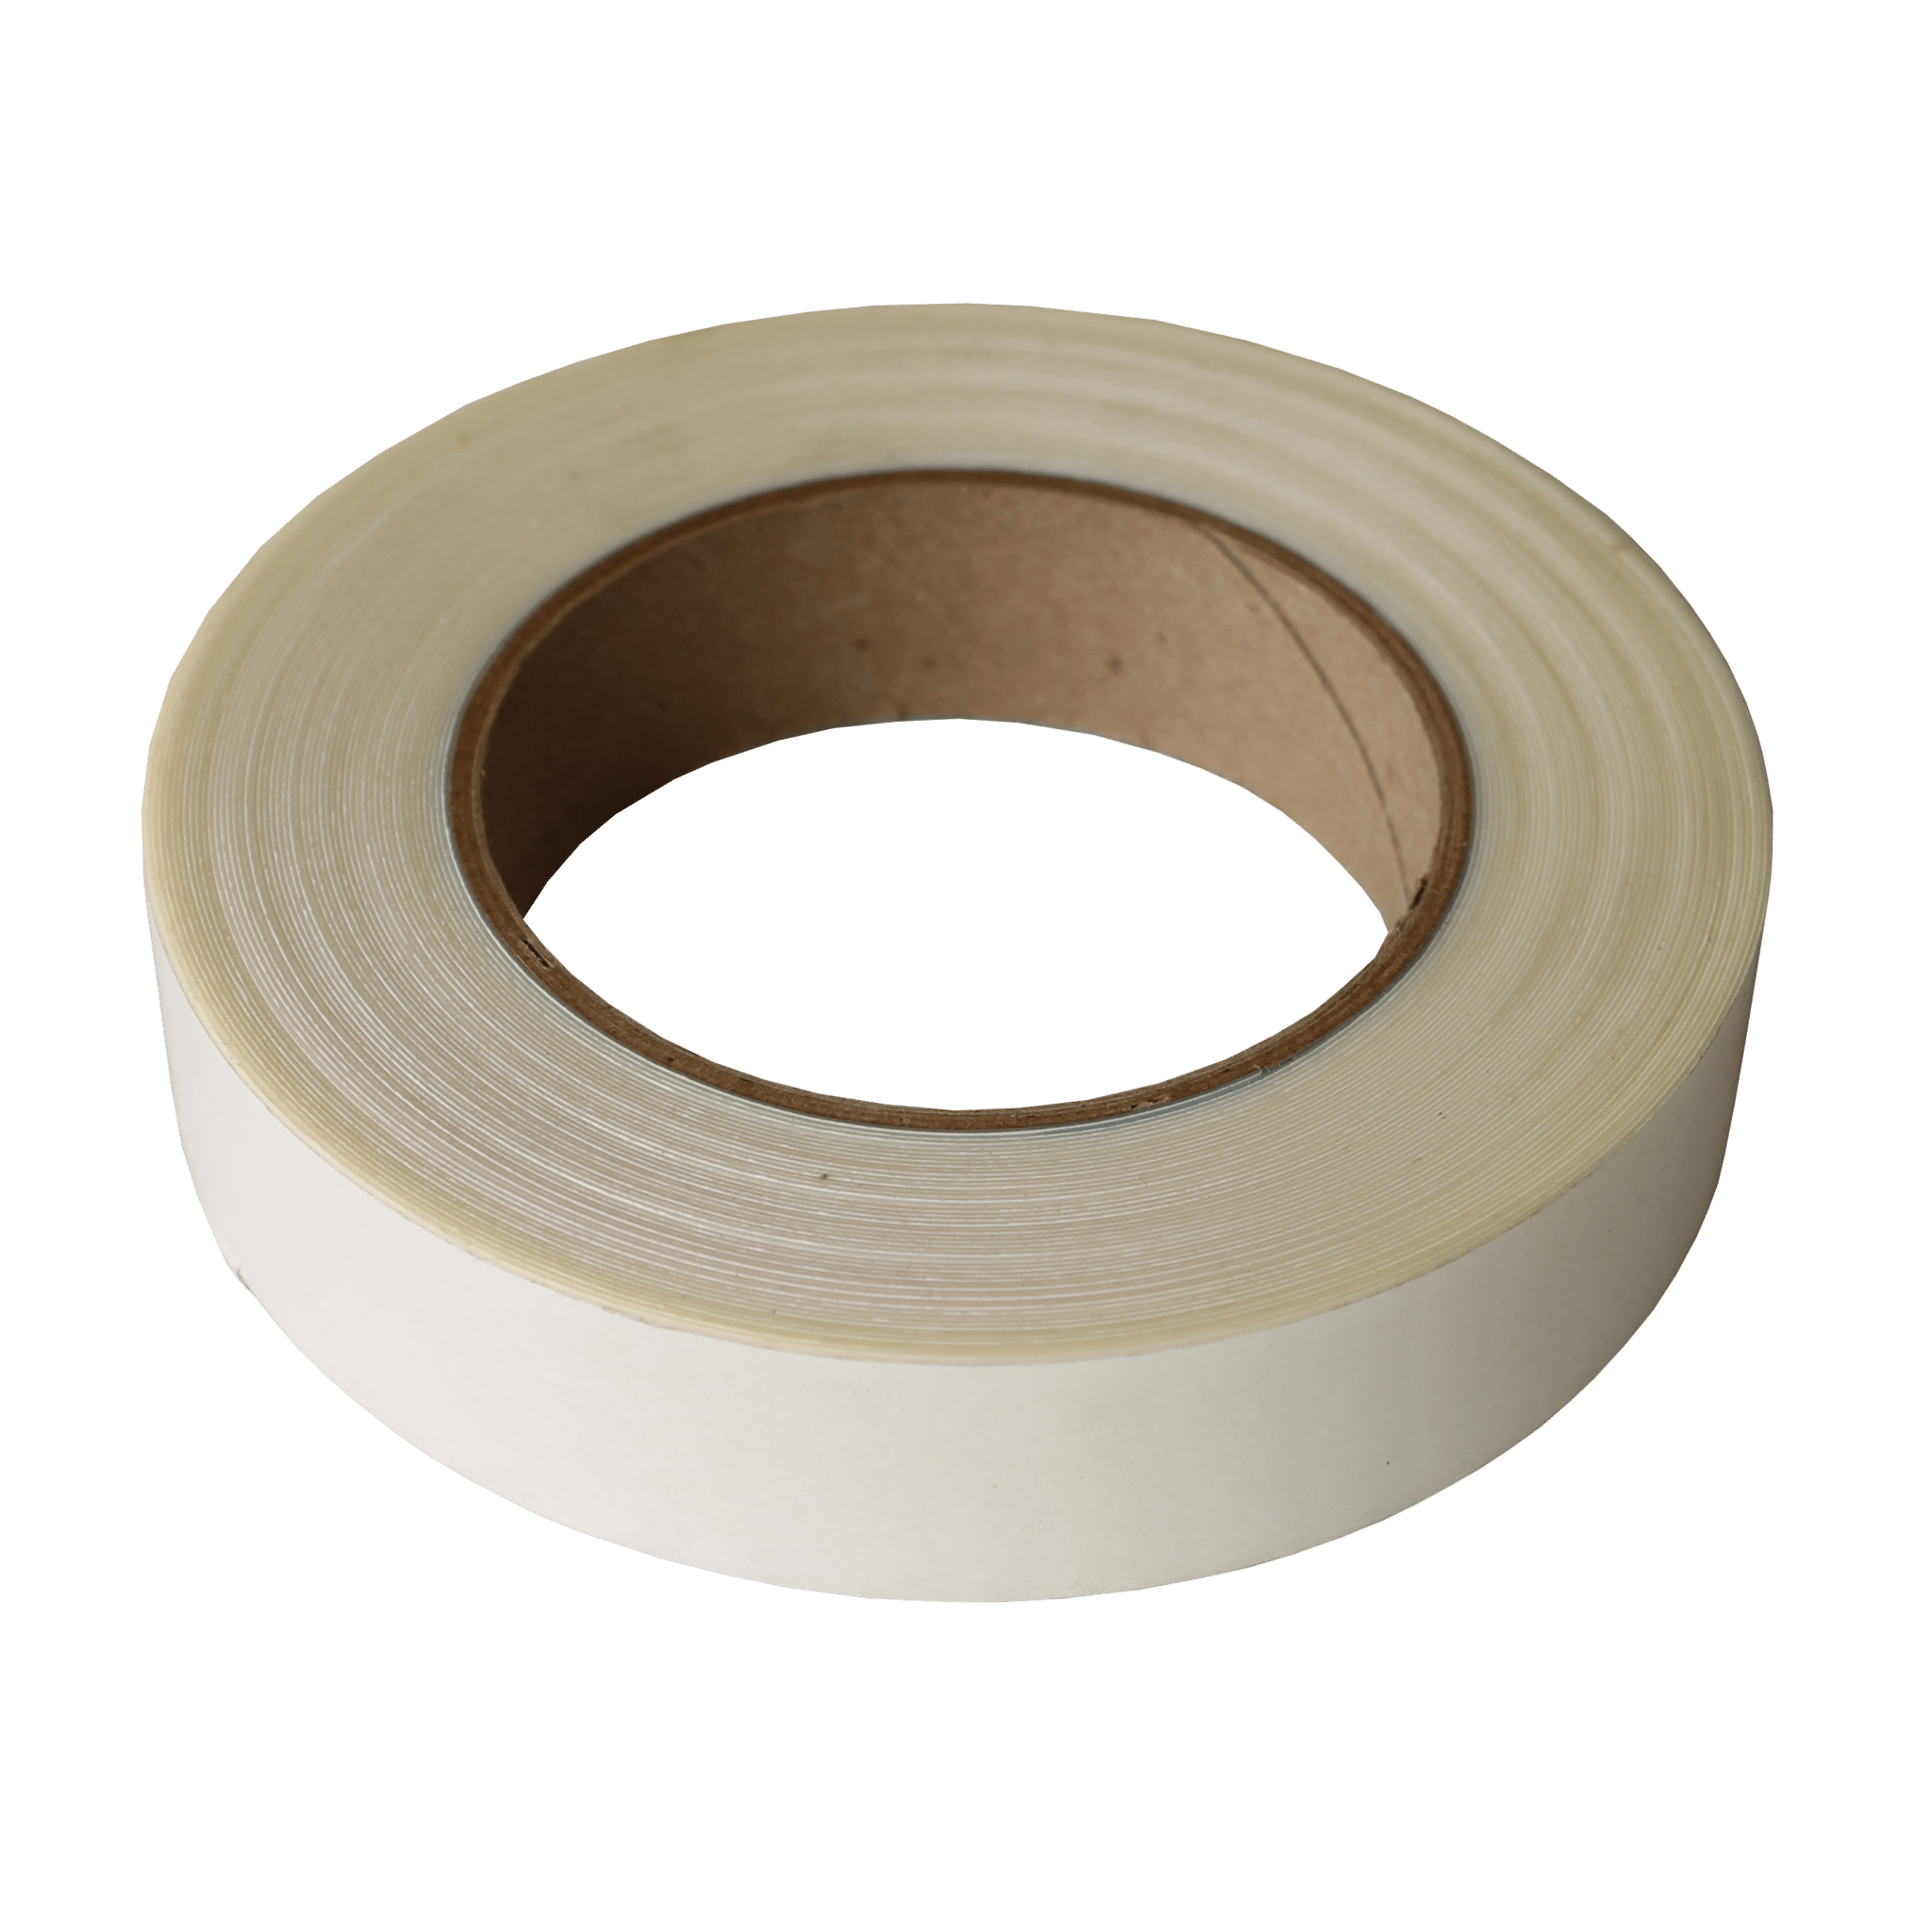 PEEK adhesive tape